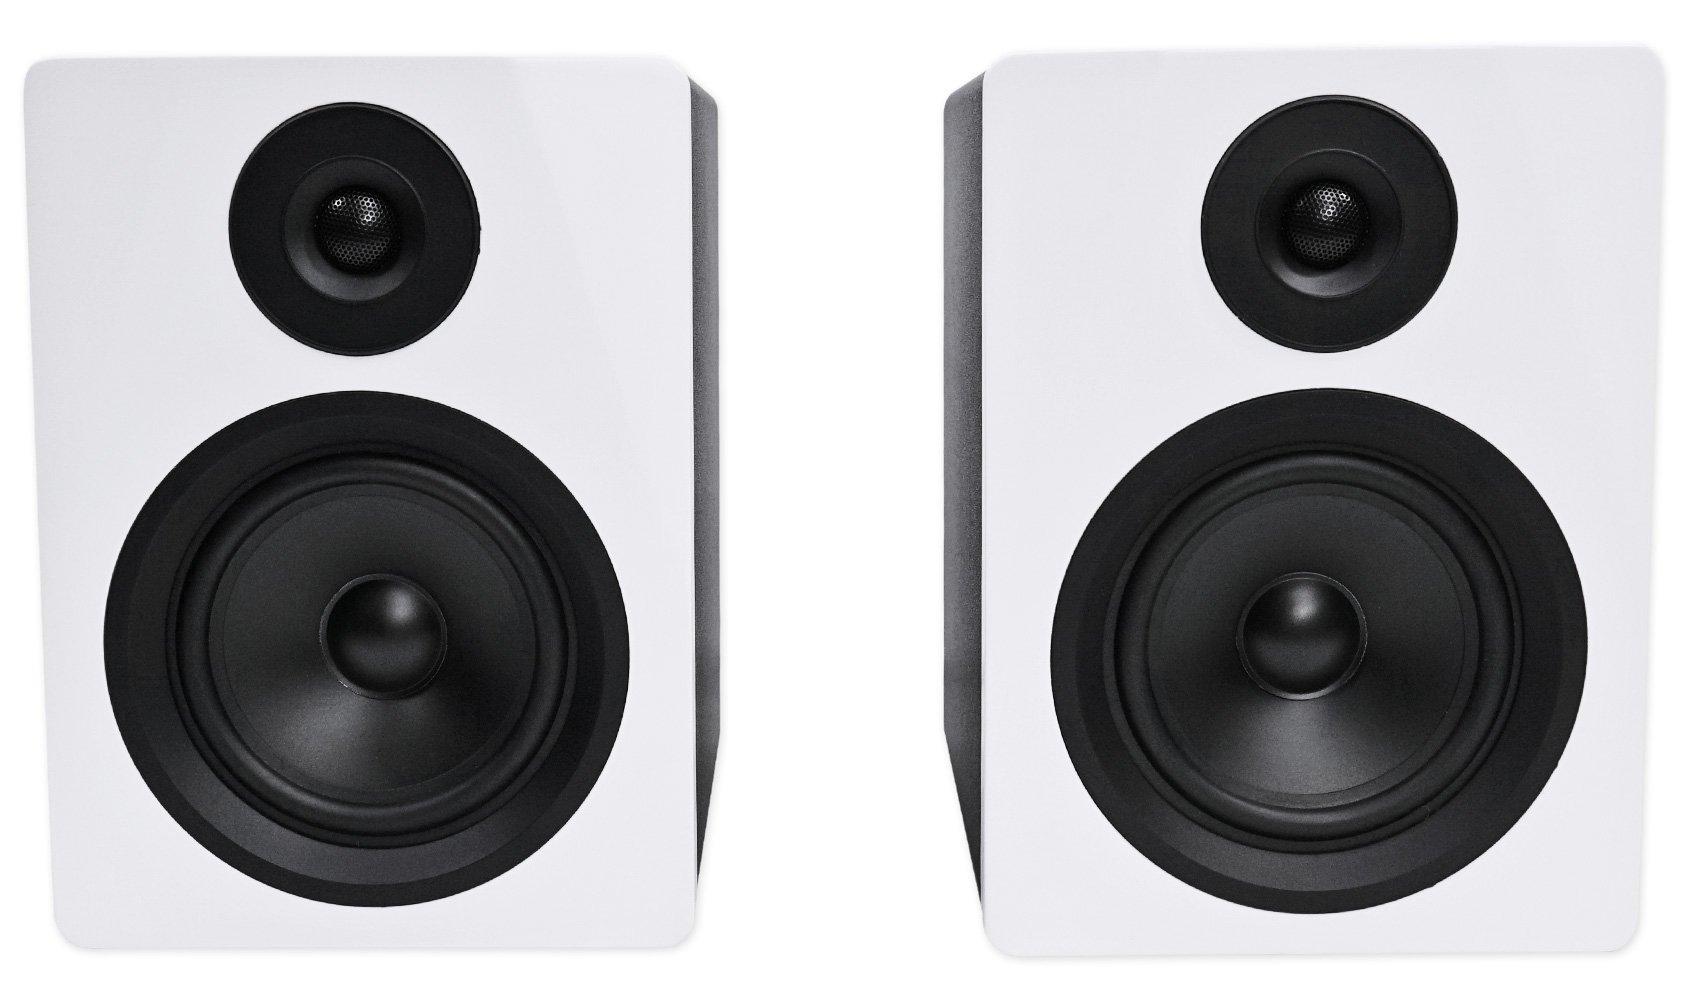 Rockville APM5W 5.25'' 2-Way 250 Watt Powered USB Studio Monitor Speakers in White (Pair)